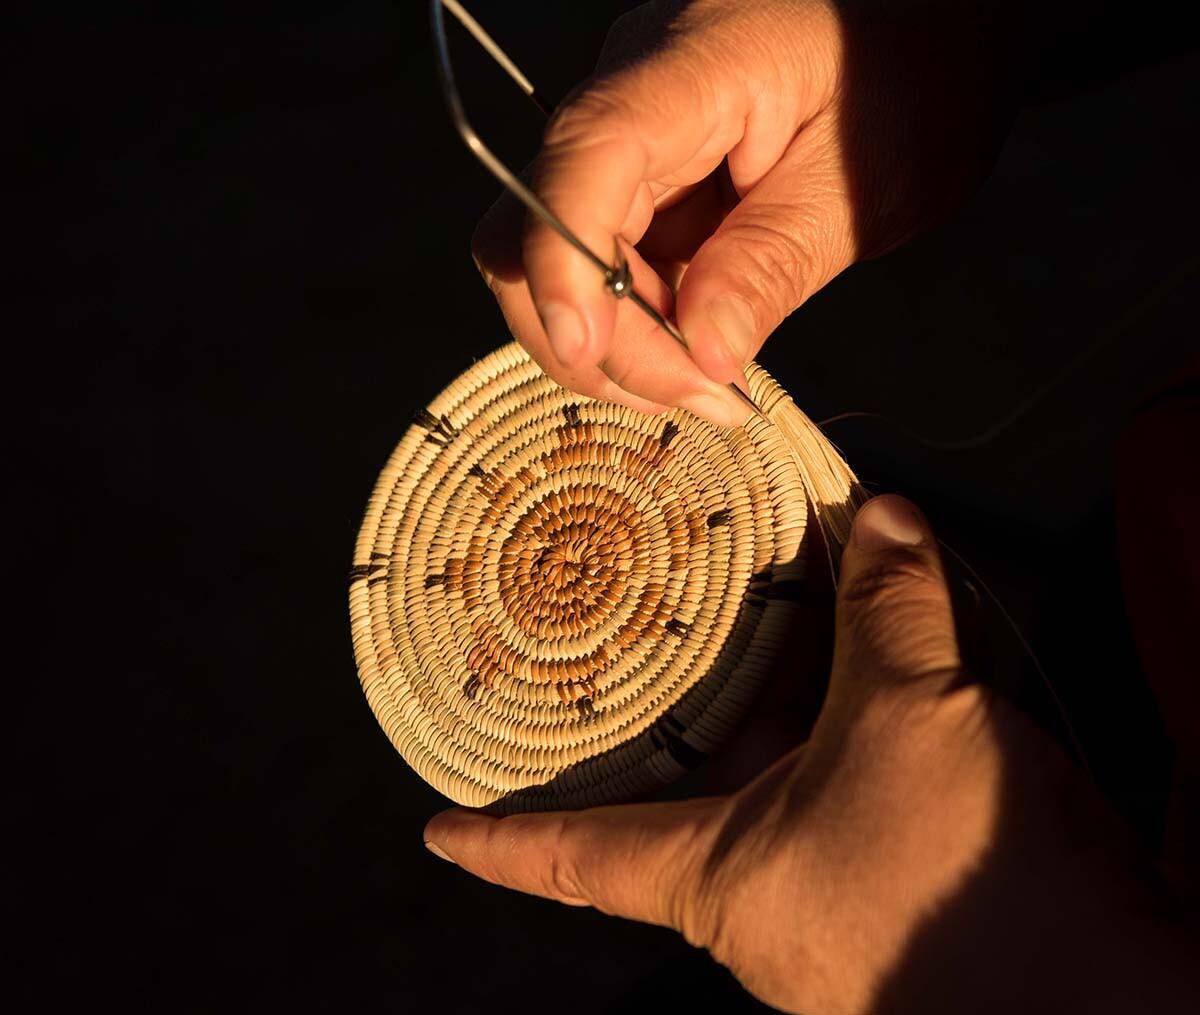 Maria de los Angeles Carillo using an awl | Rose Ramirez